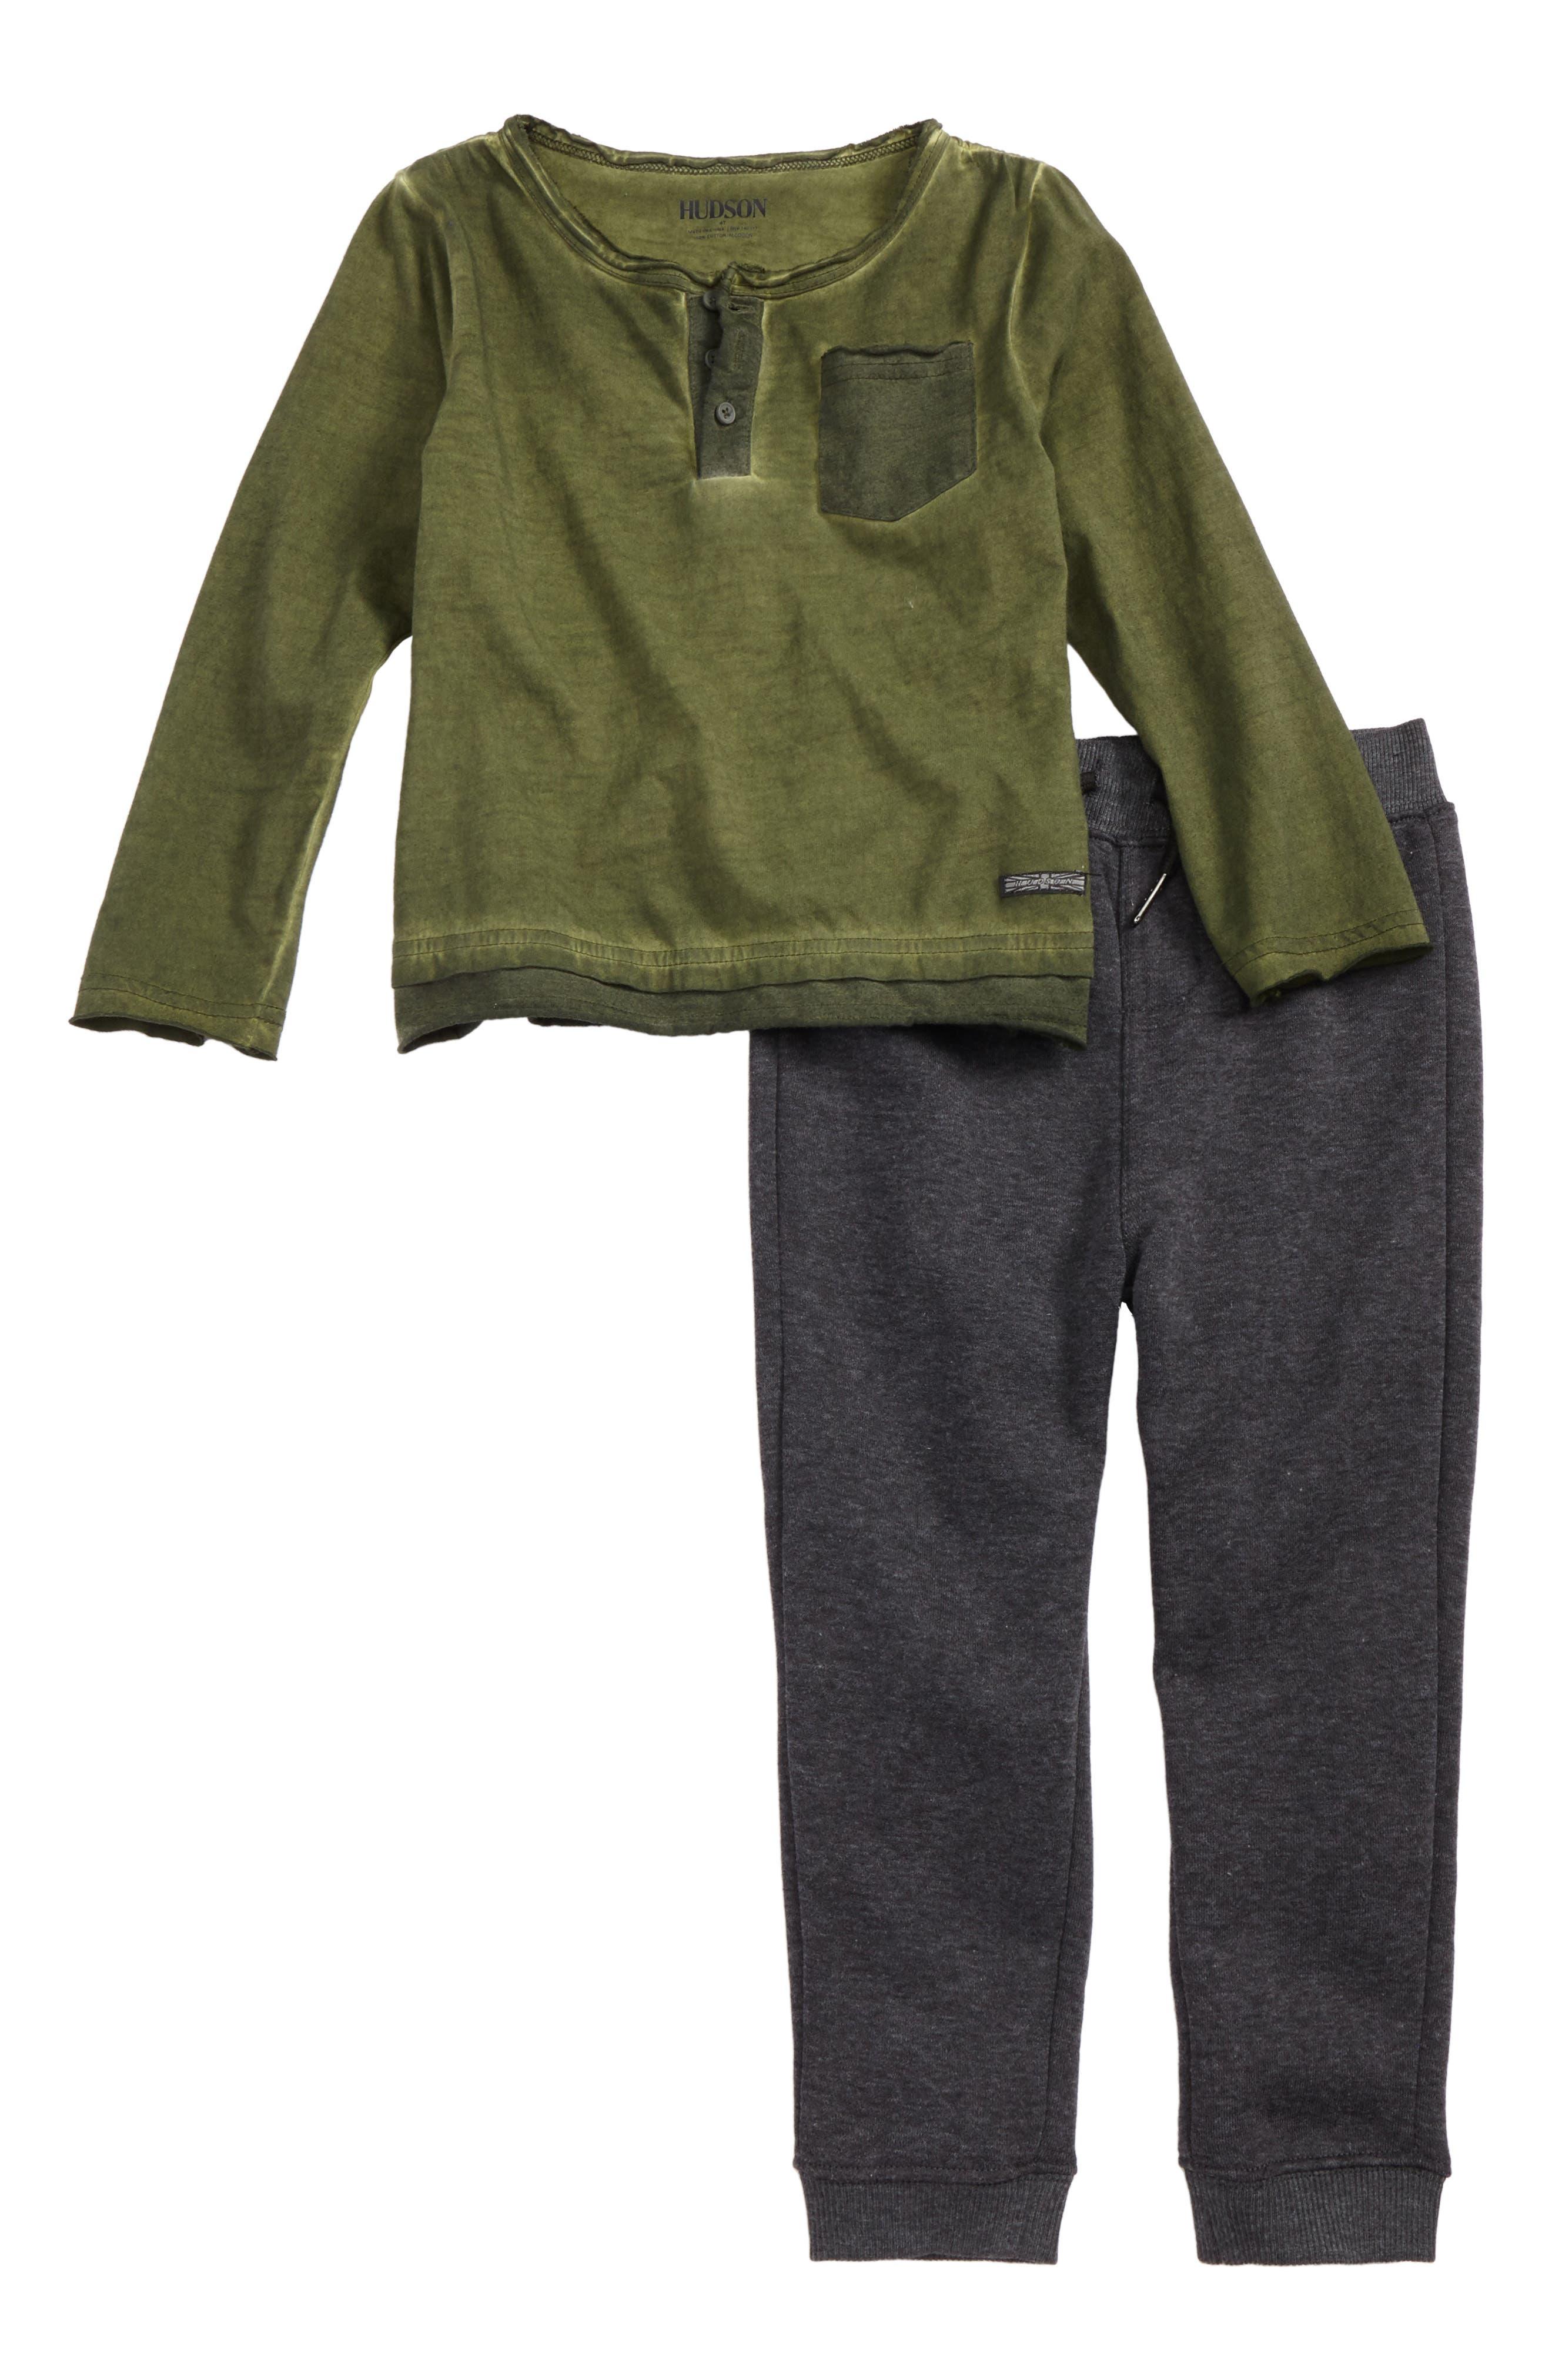 Main Image - Hudson Kids Henley Top & Sweatpants Set (Toddler Boys)